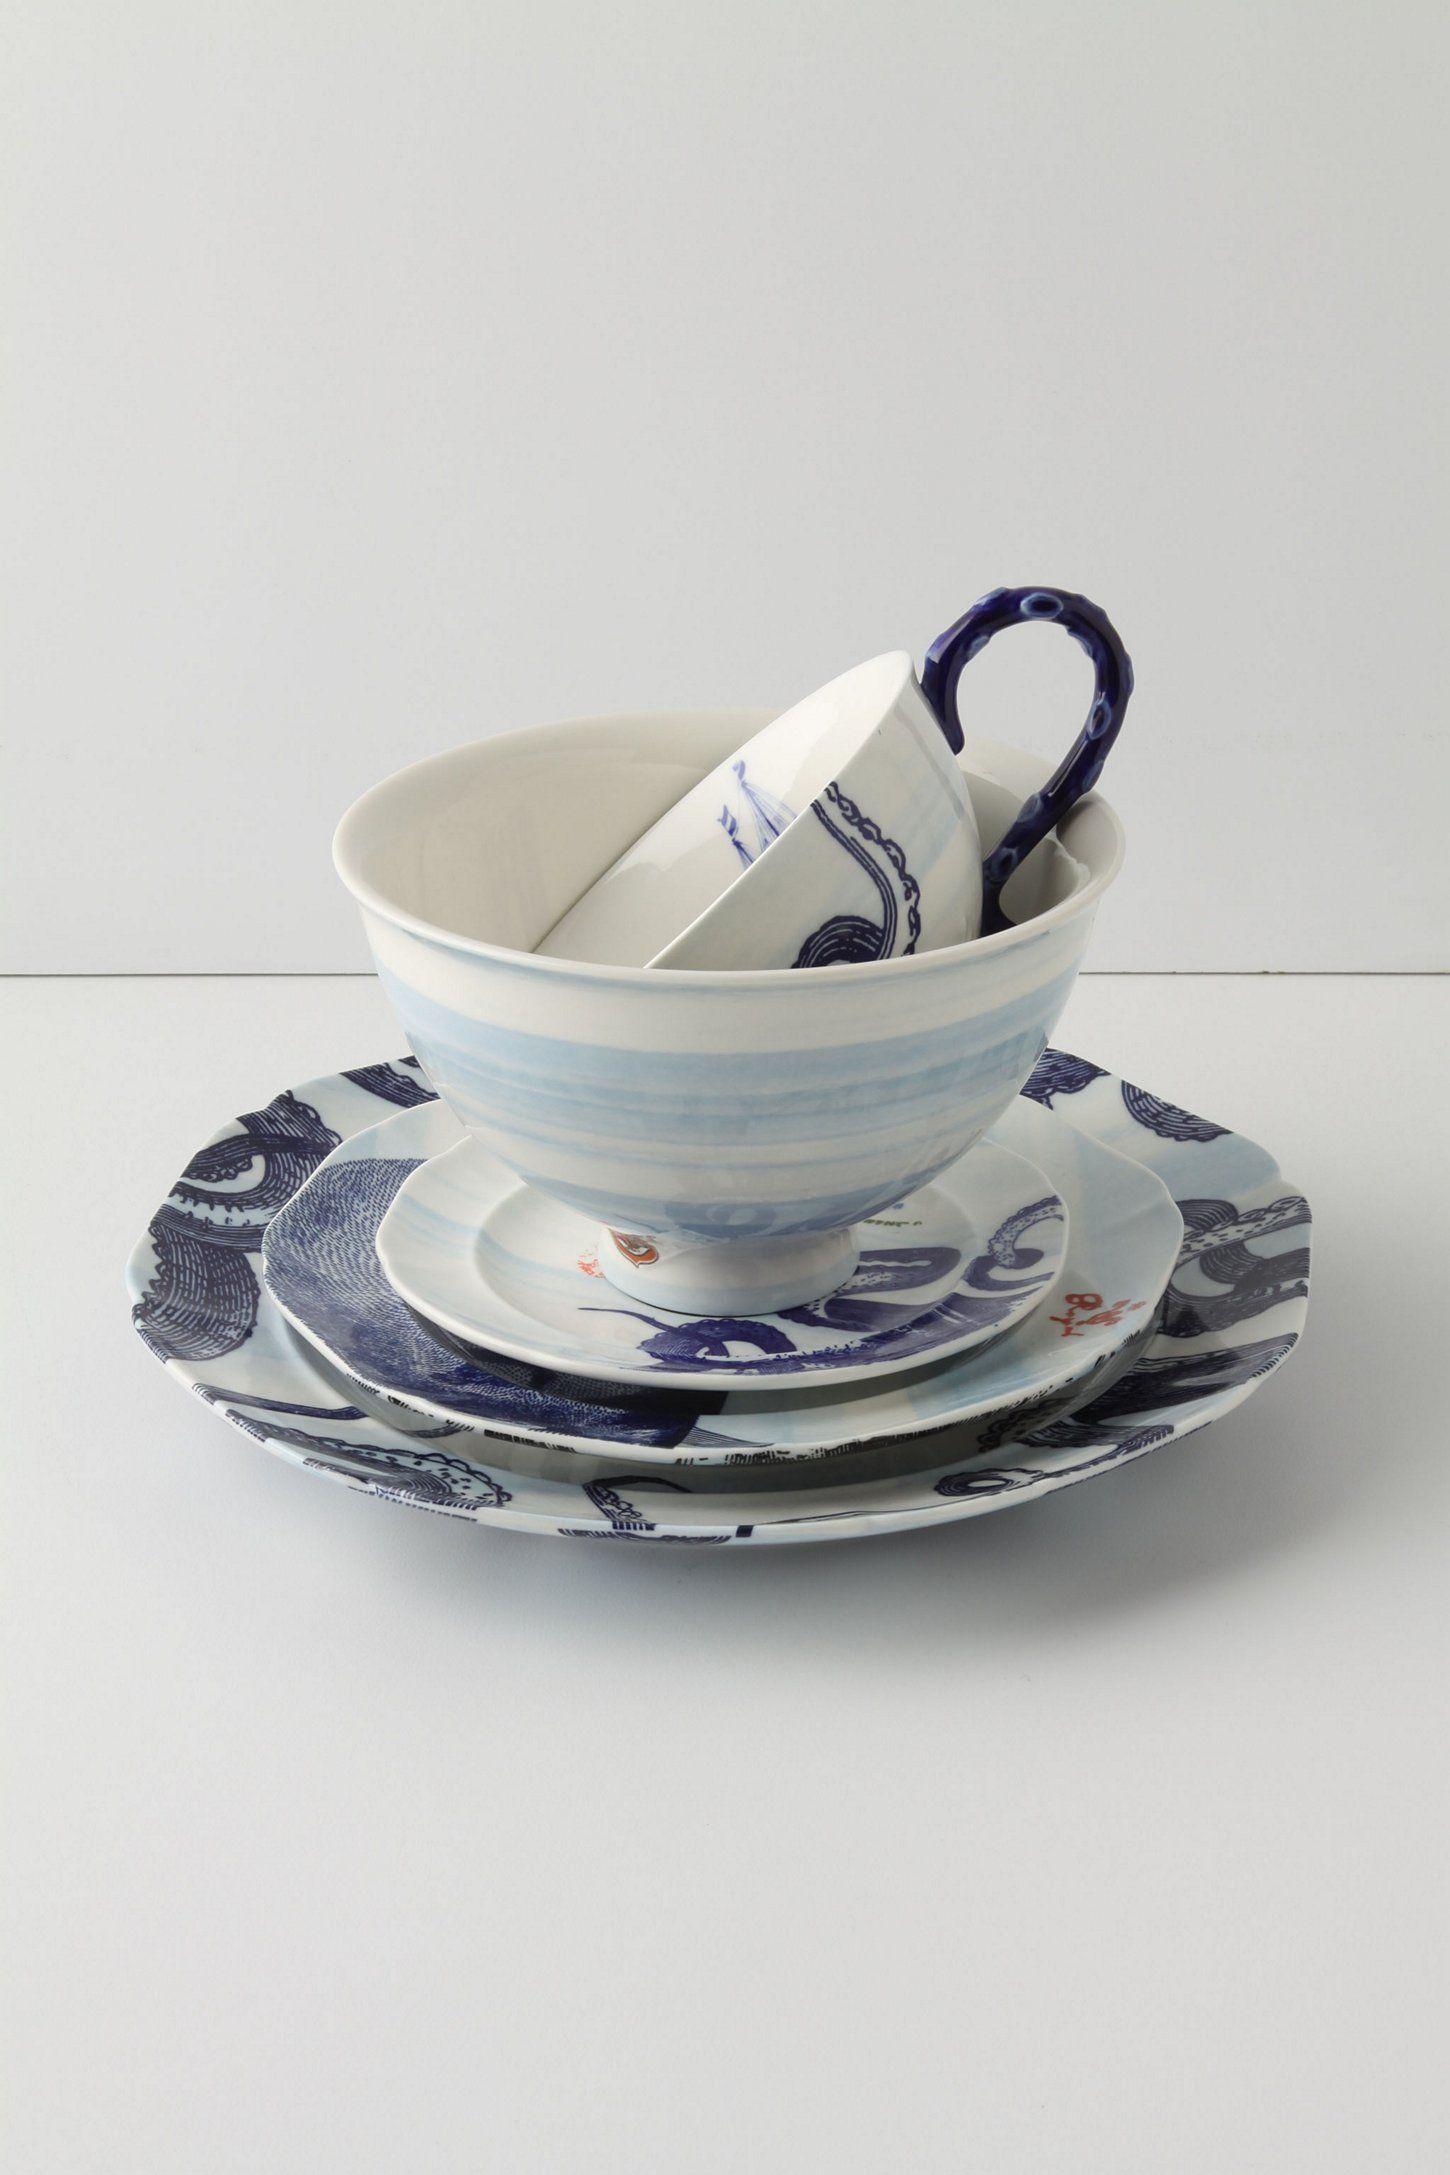 Delft · nautical themed dinnerware- ... & From The Deep Dinner Plate | Dinnerware Teas and Teacup